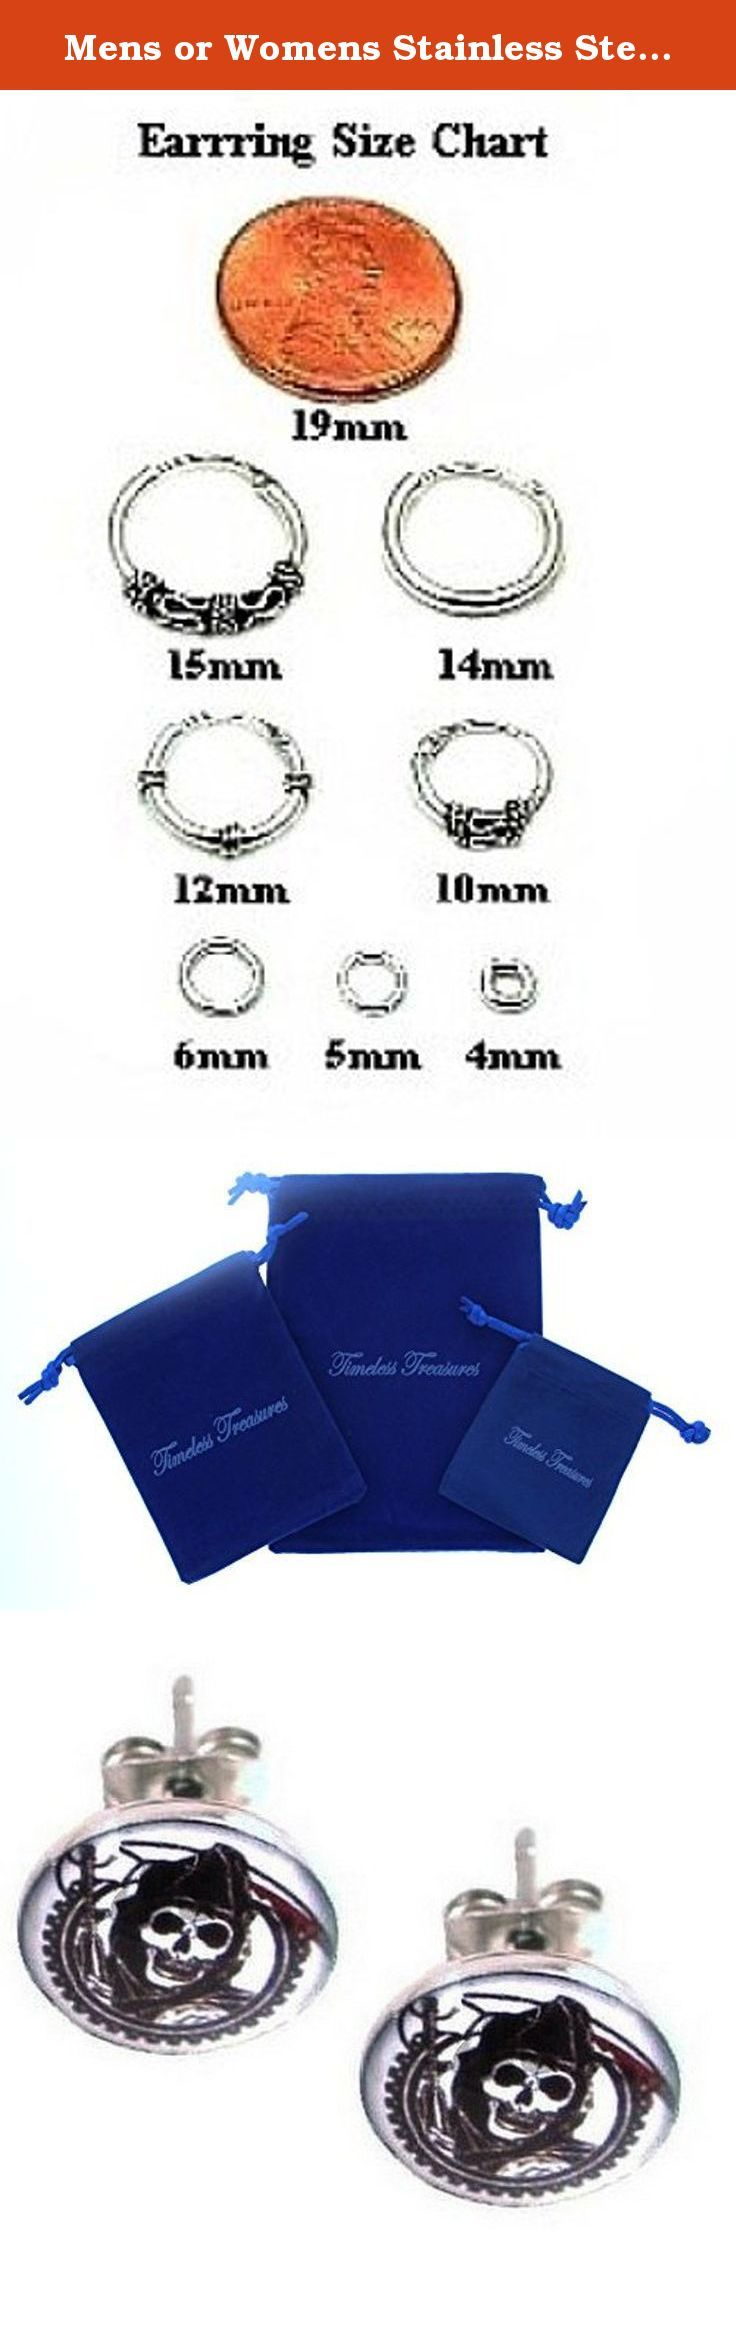 "Mens or Womens Stainless Steel Sons of Anarchy Stud Earrings - 10 mm Diameter (.39""). Stainless Steel Sons of Anarchy Stud Earrings - 10 mm Diameter (.39"")."